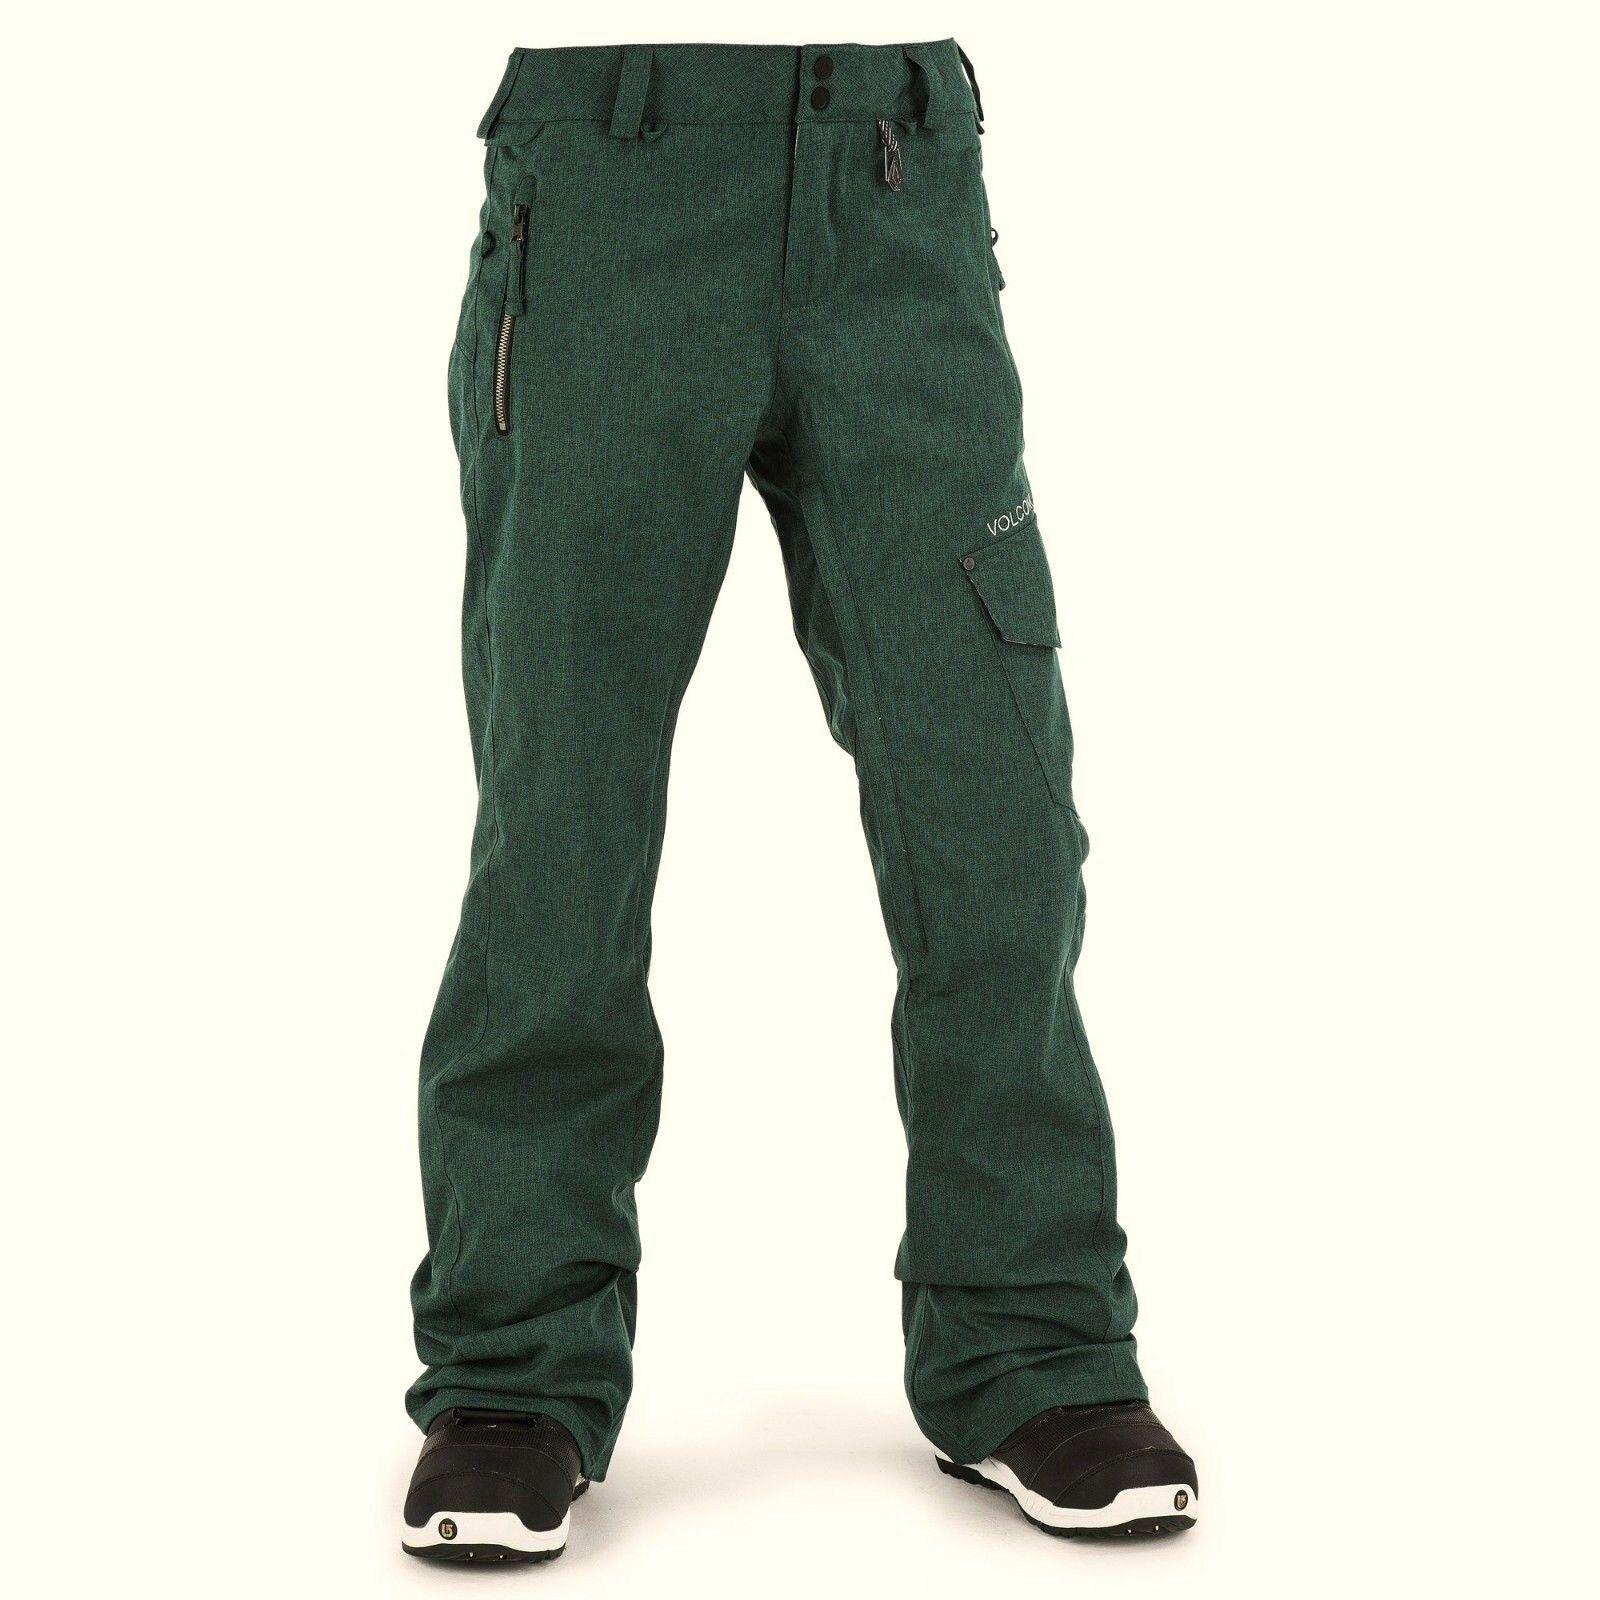 VOLCOM Women's PLATEAU Pants - Small - MNG - NWT